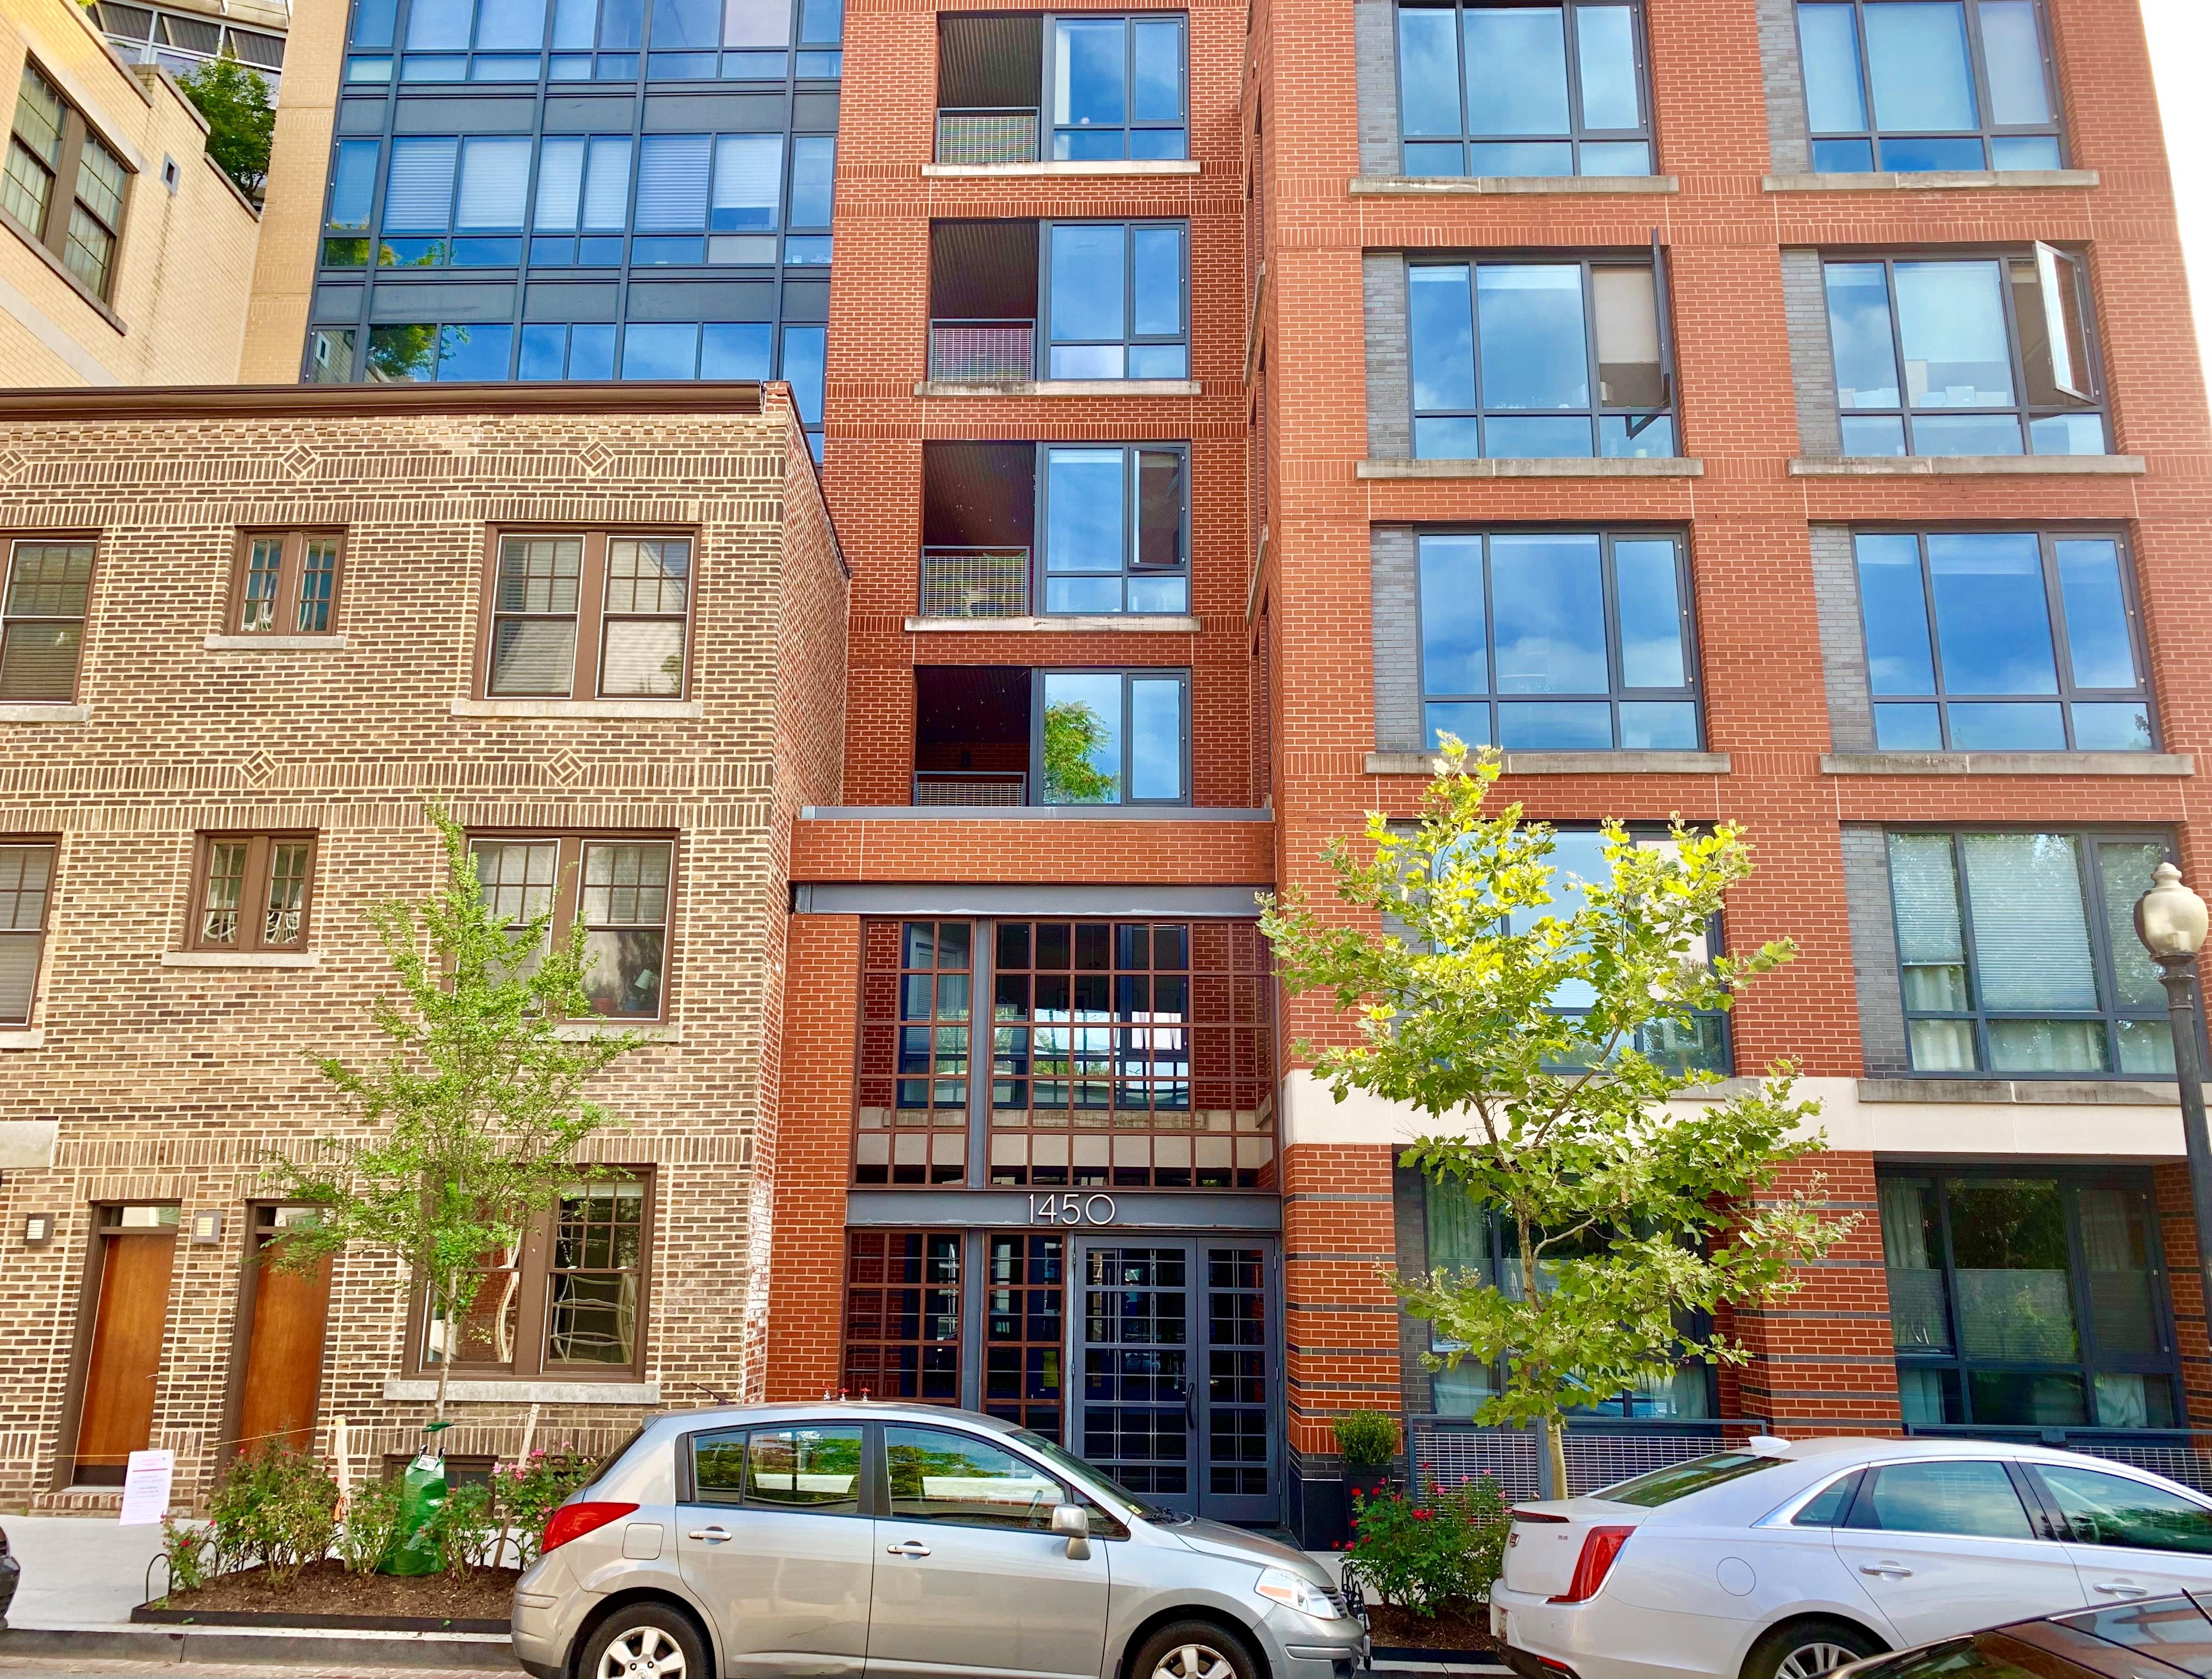 Washington, DC VA Condo Buildings & VA Approved Condos For Sale. Citta 50. Artyom Shmatko Realtor.